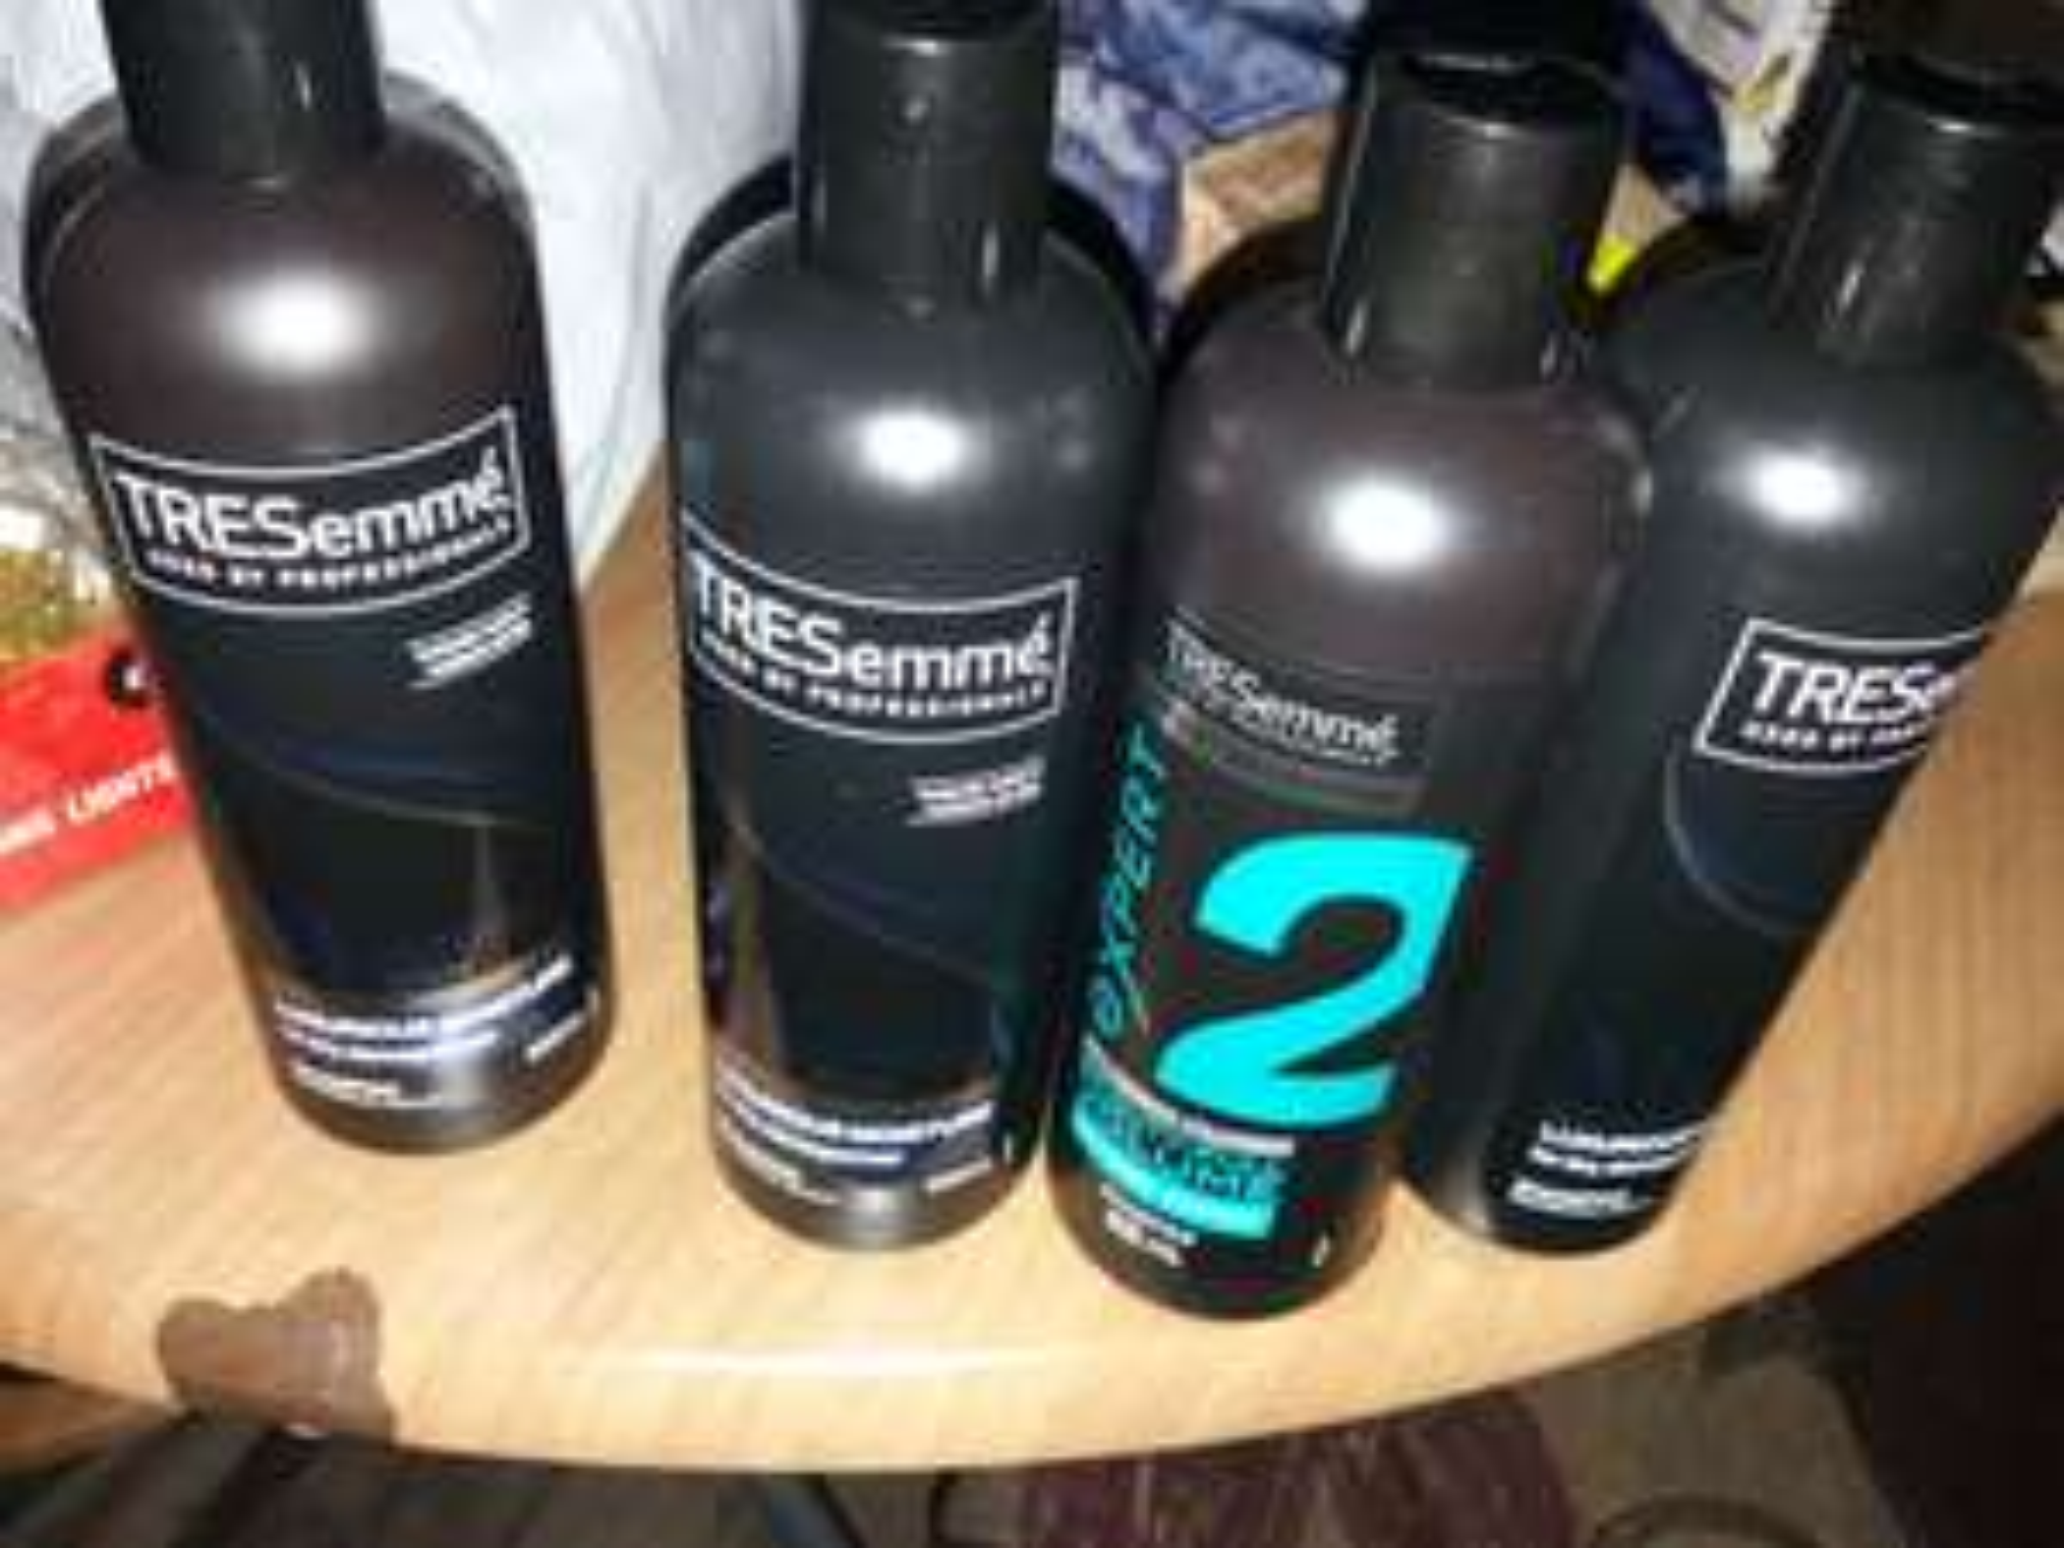 Tresemme shampoo  500ml 75p asda huddersfield